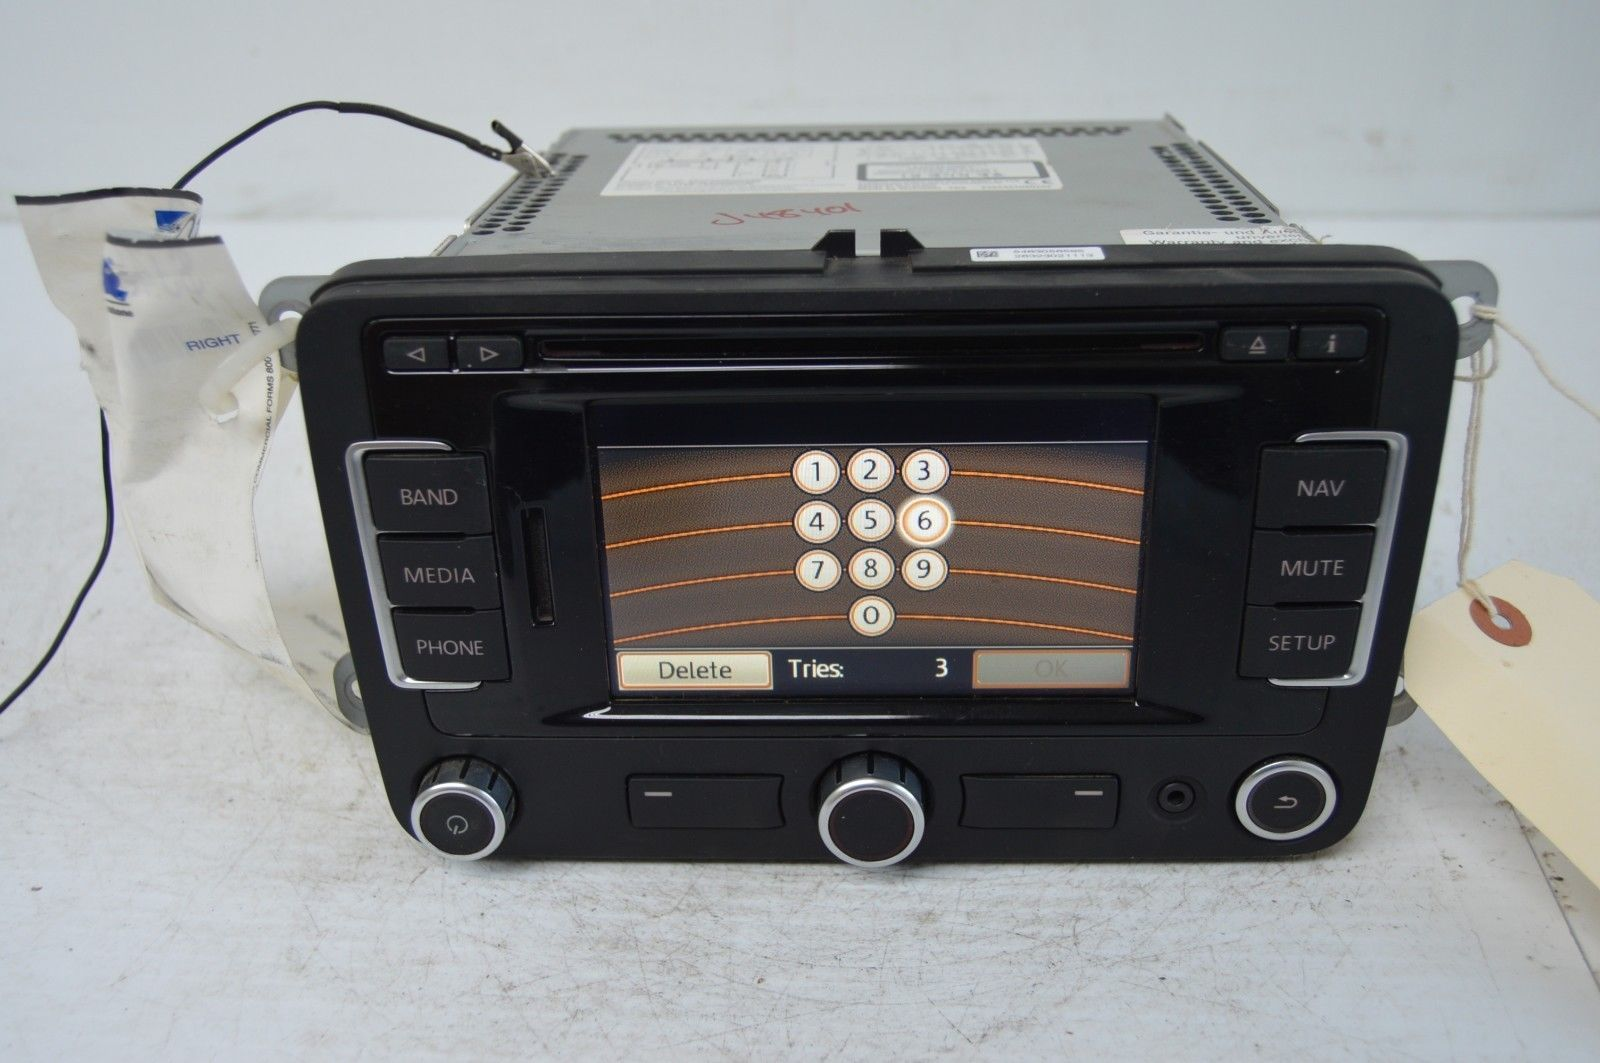 2011 volkswagen tiguan radio cd player oem radio. Black Bedroom Furniture Sets. Home Design Ideas